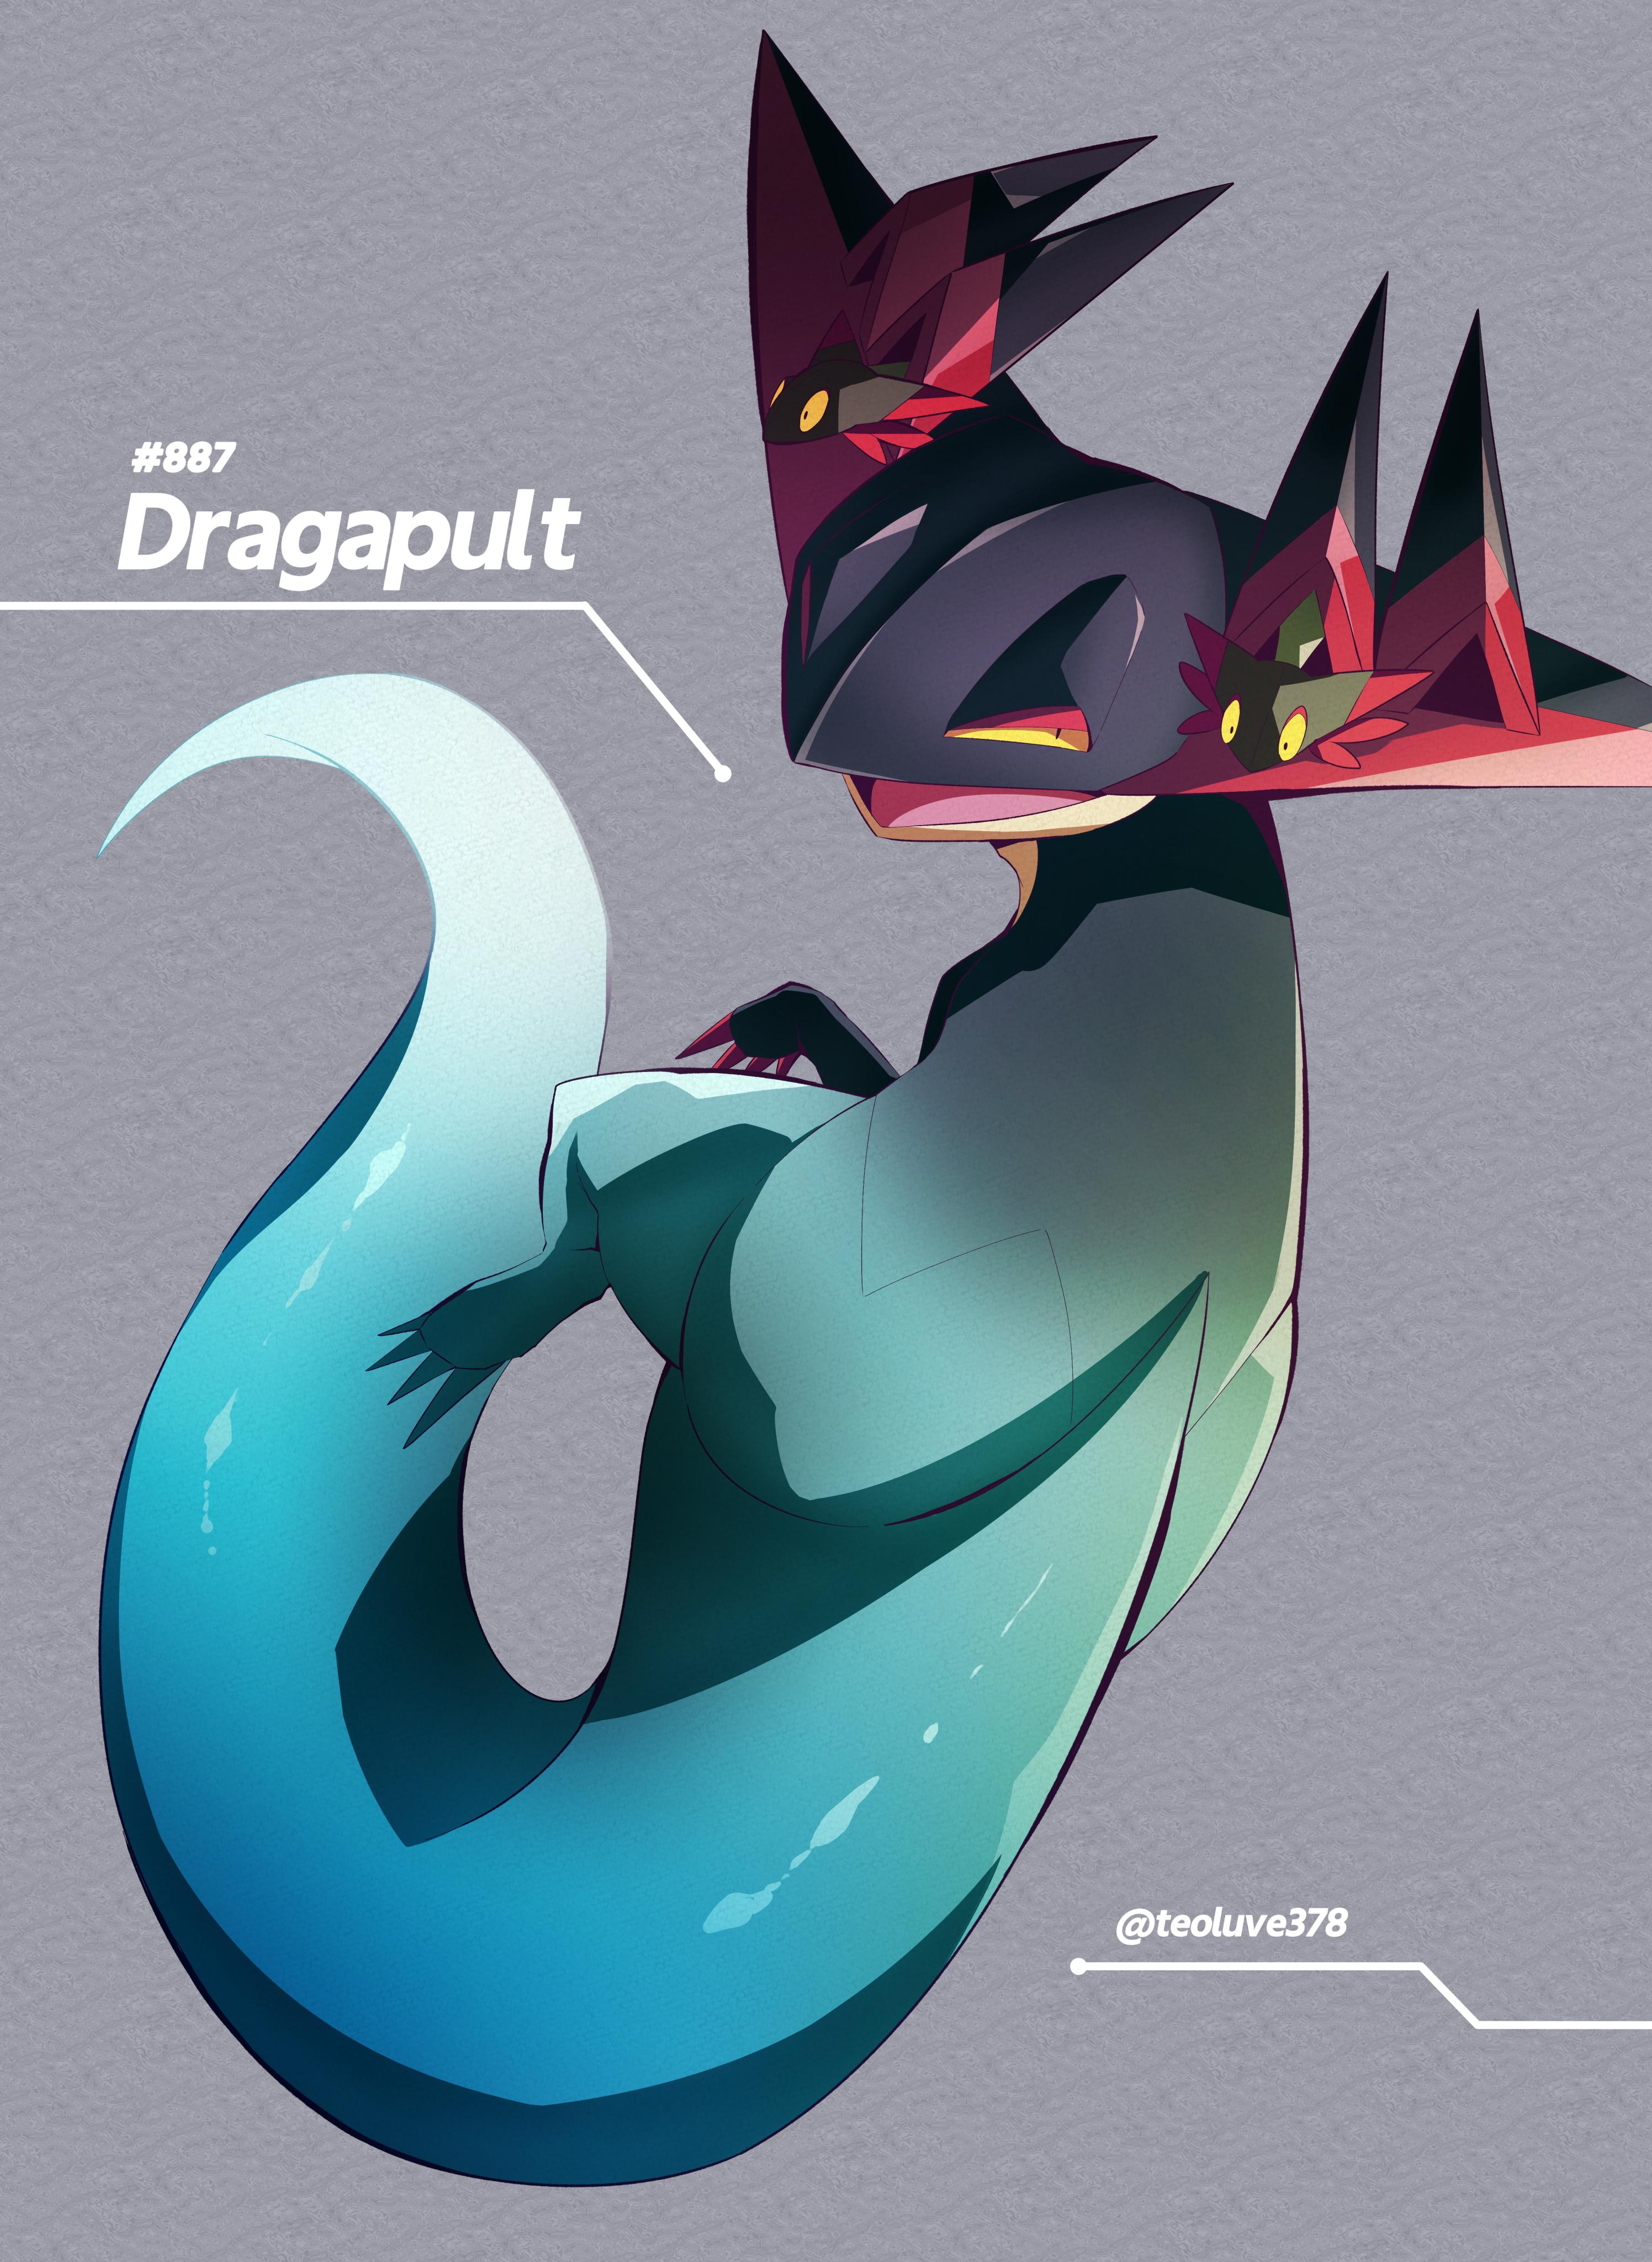 Dragapult - Pokémon Sword & Shield - Image #2892166 - Zerochan Anime Image  Board